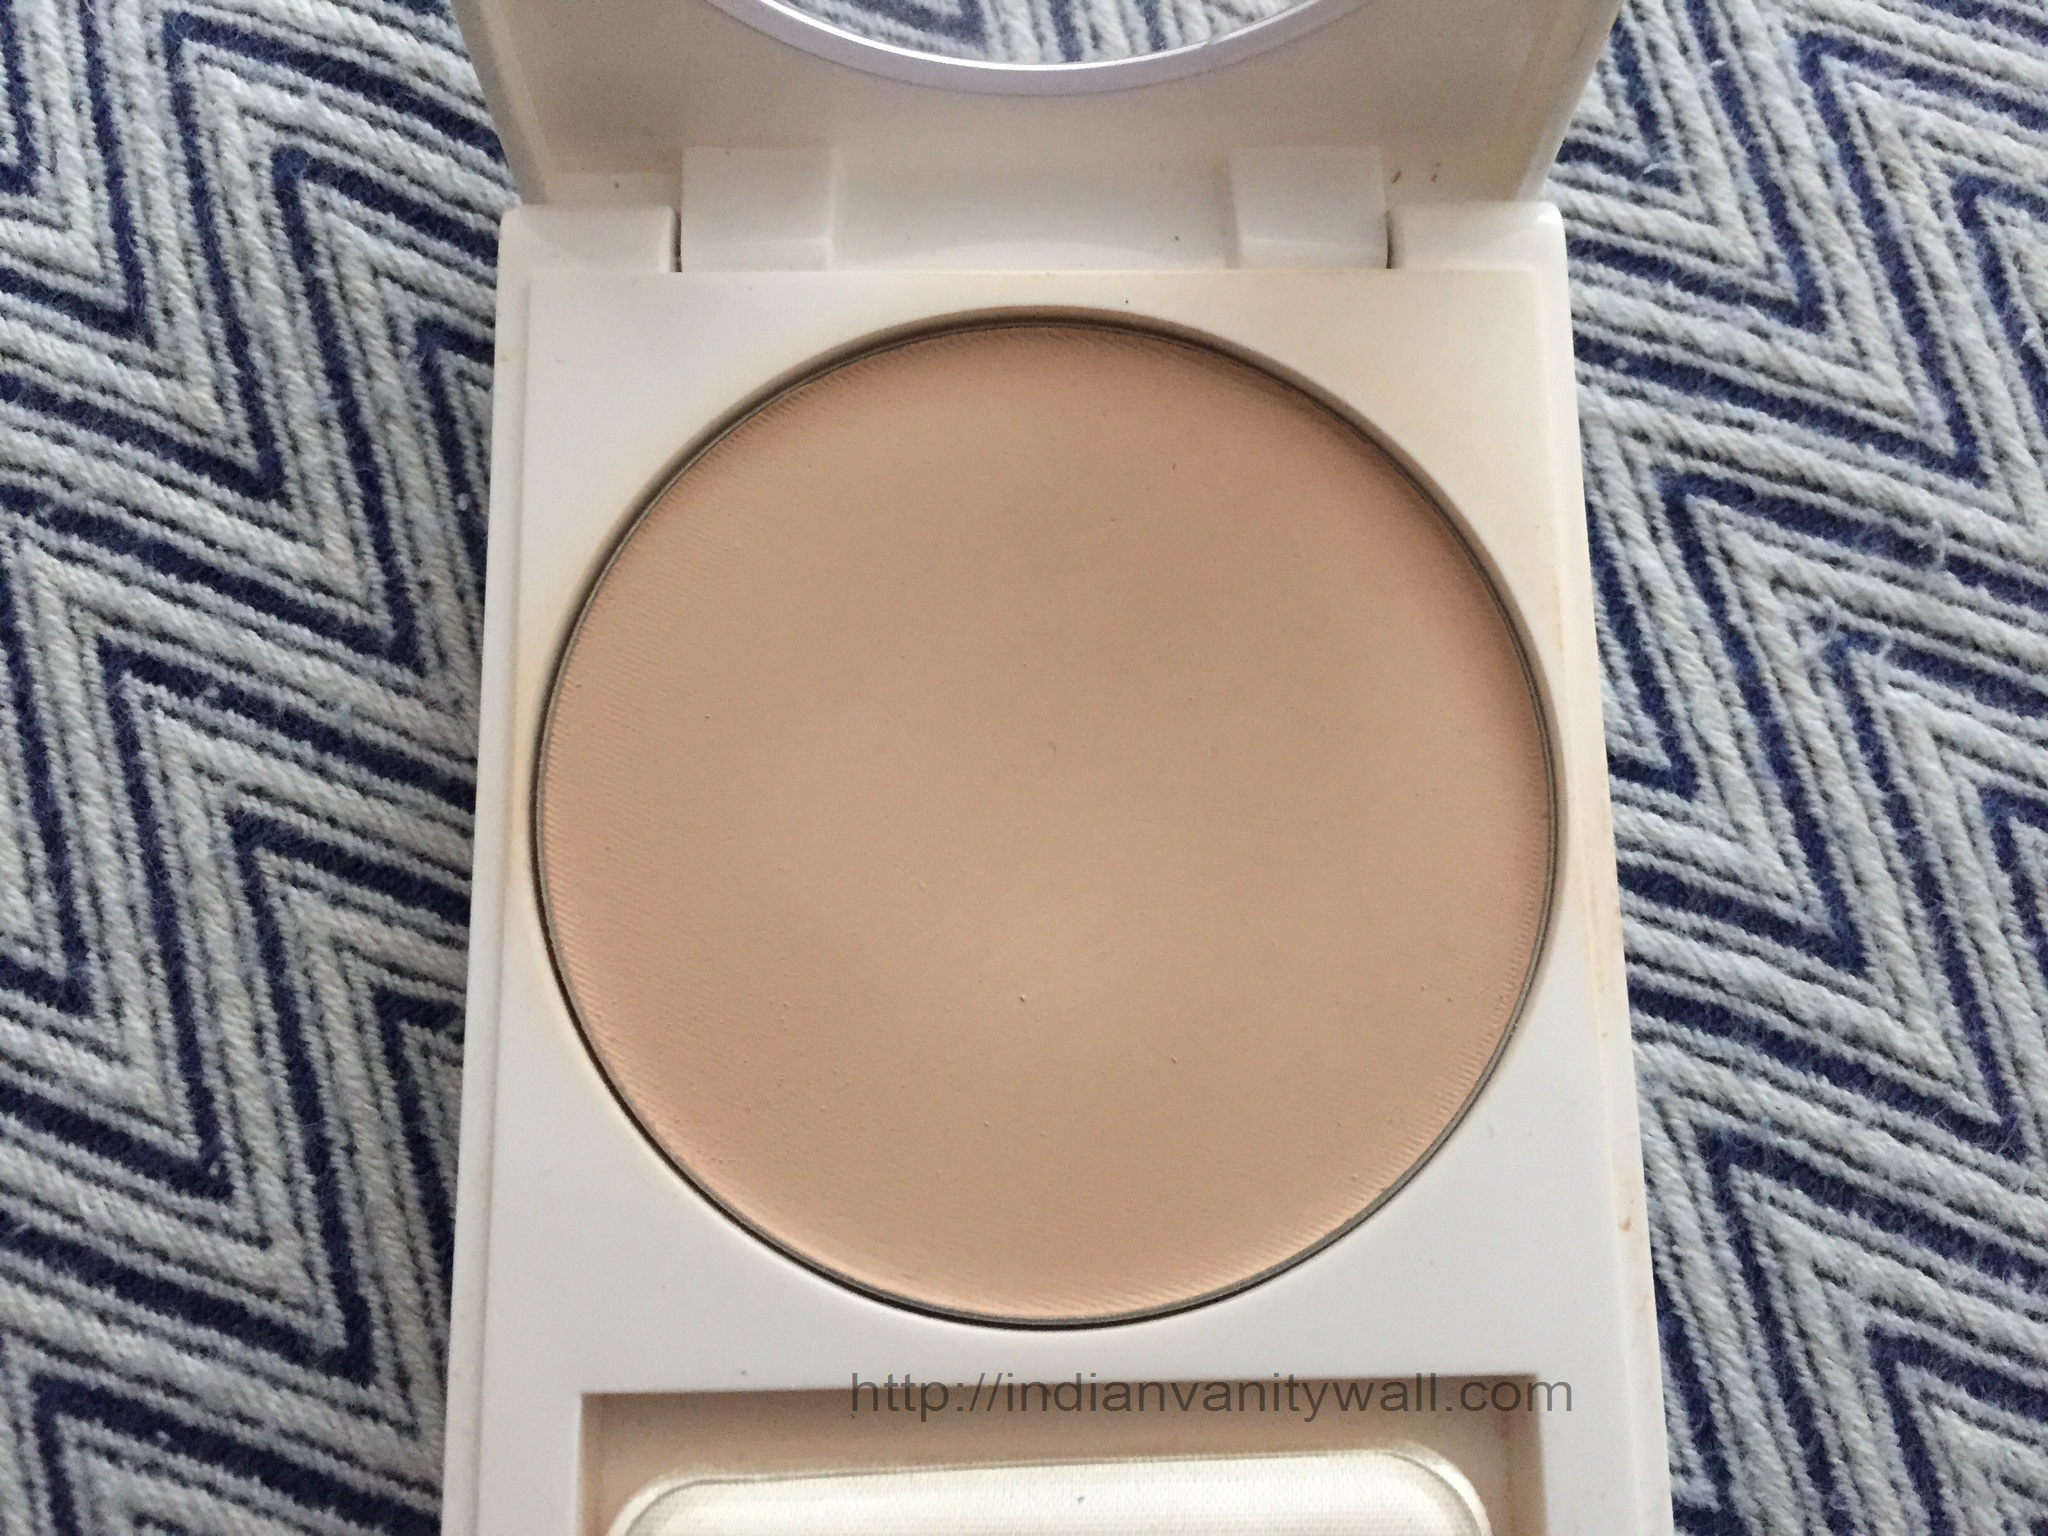 Revlon Nearly Naked Pressed Powder Medium Deep: Buy Revlon